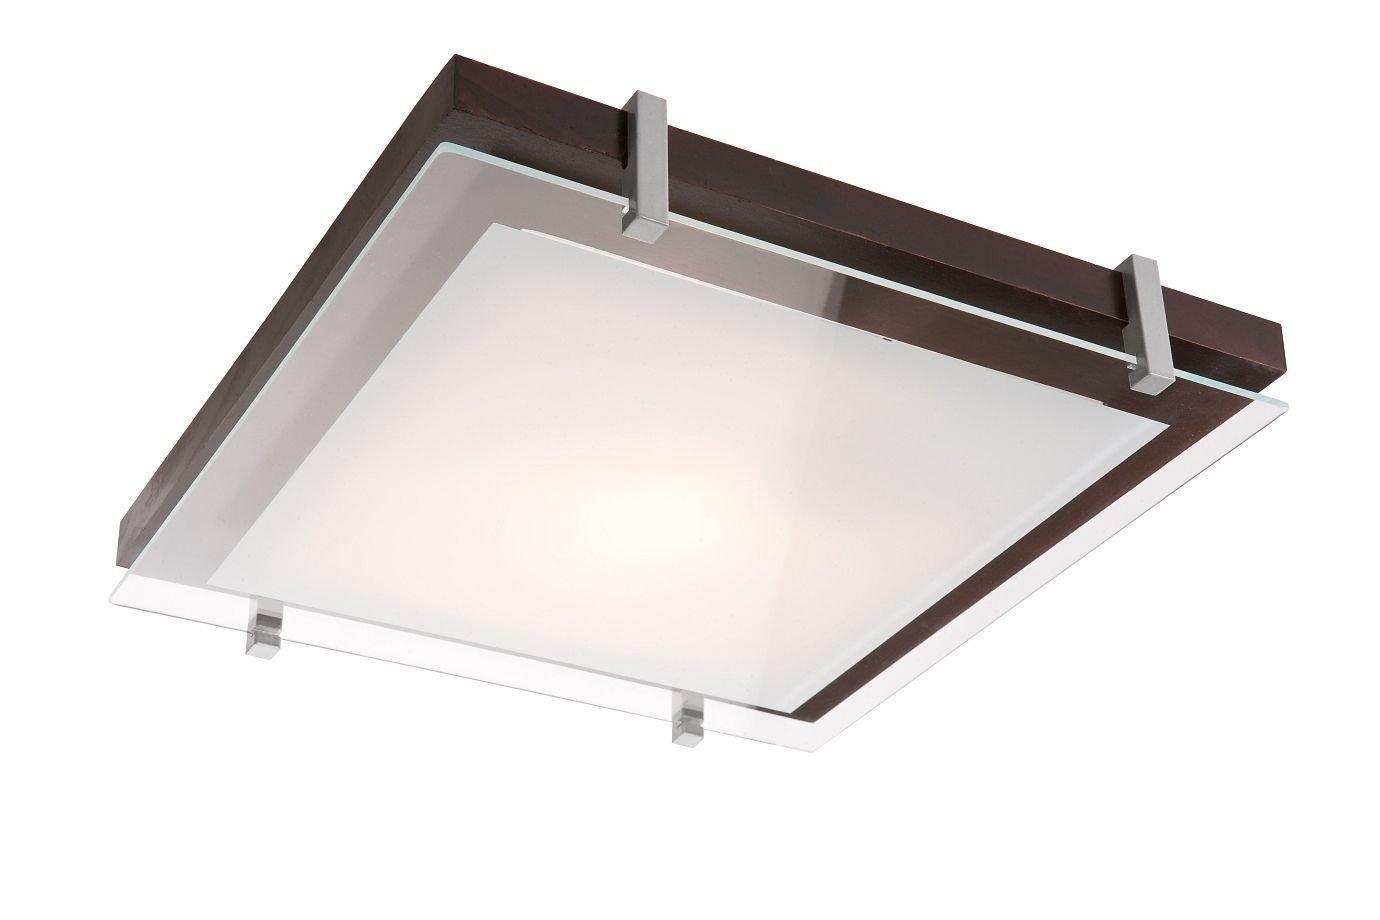 Naka24 Deckenleuchte Deckenlampe Holz Glas mod PD E27 eckig (PD 2.1 25711 Wenge 30x30 cm)